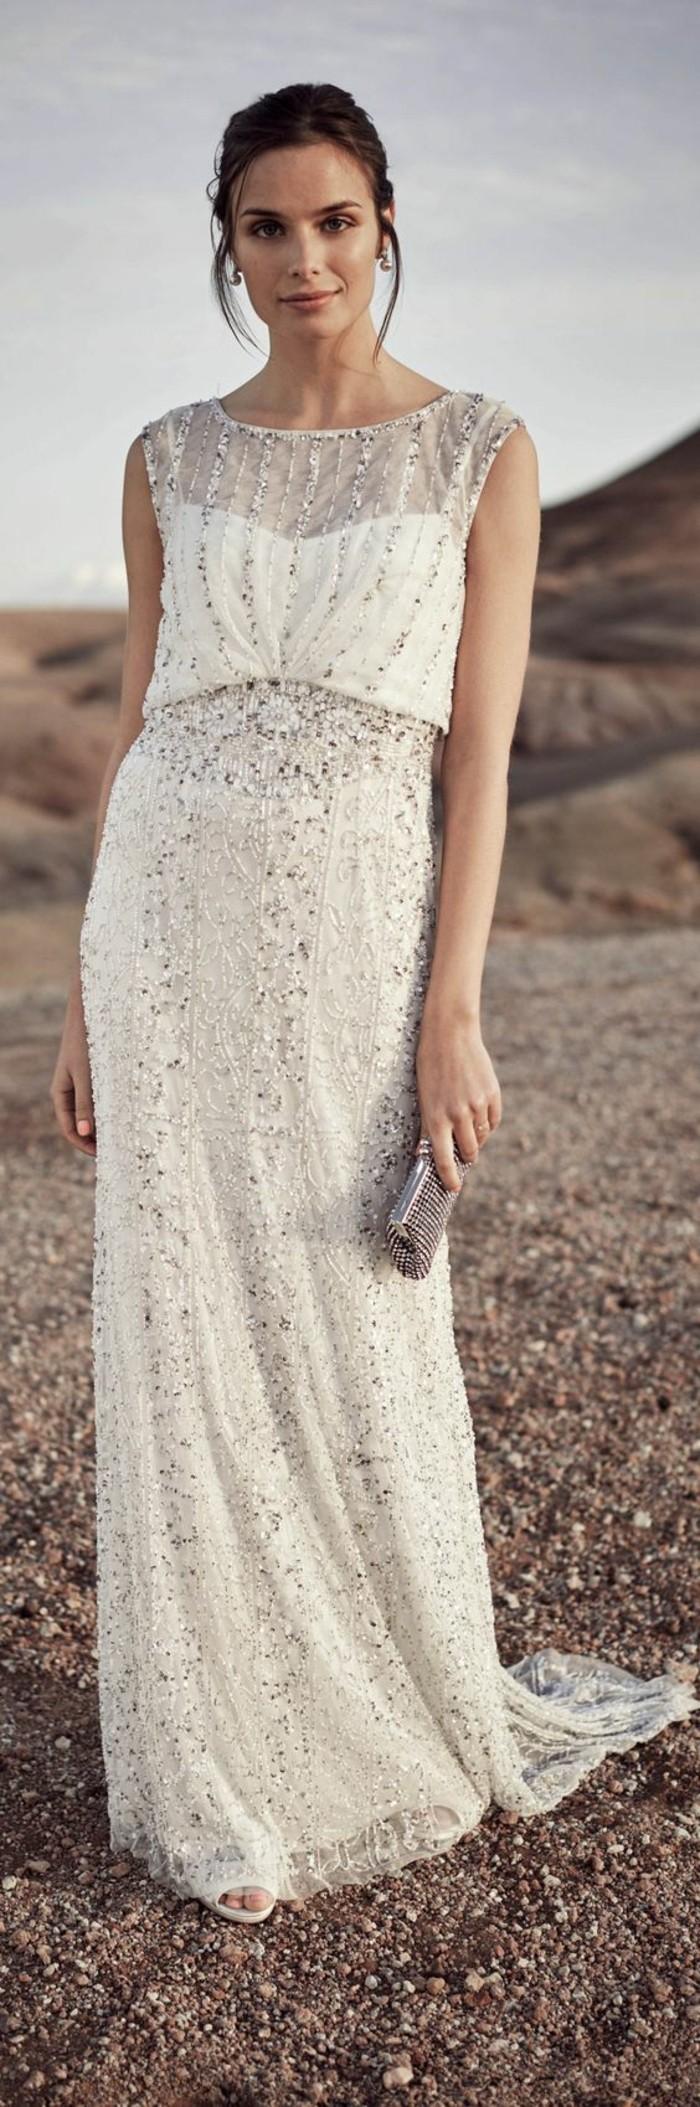 Awesome Wedding Dresses Older Brides | Wedding Photography